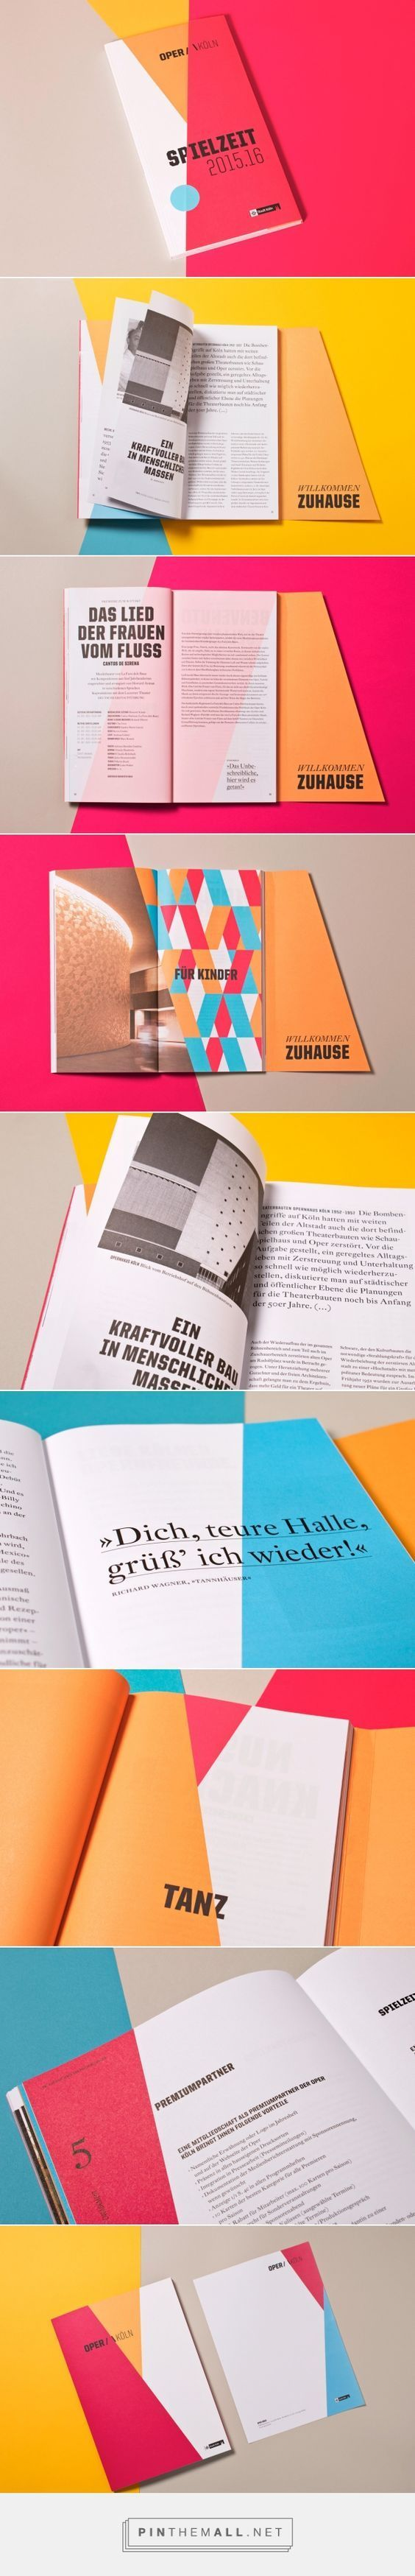 17 best images about top pharmacy brochure designs on pinterest creative brochure design